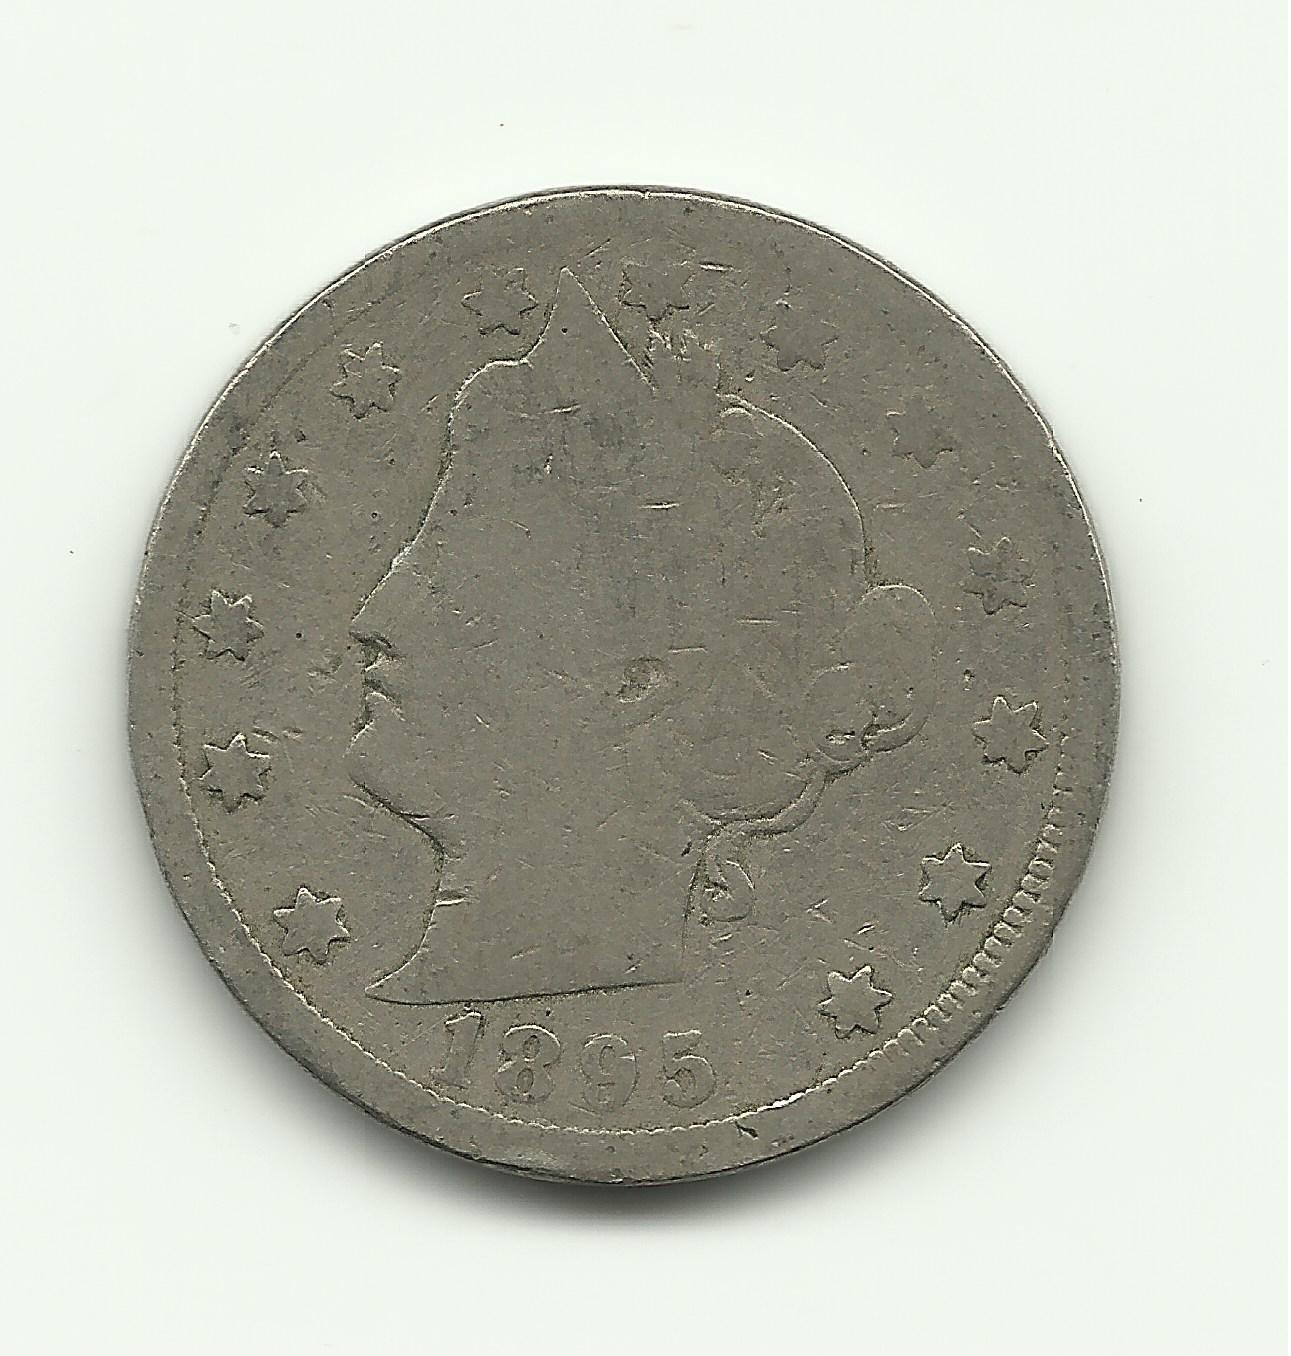 1895 #1 V Liberty nickel